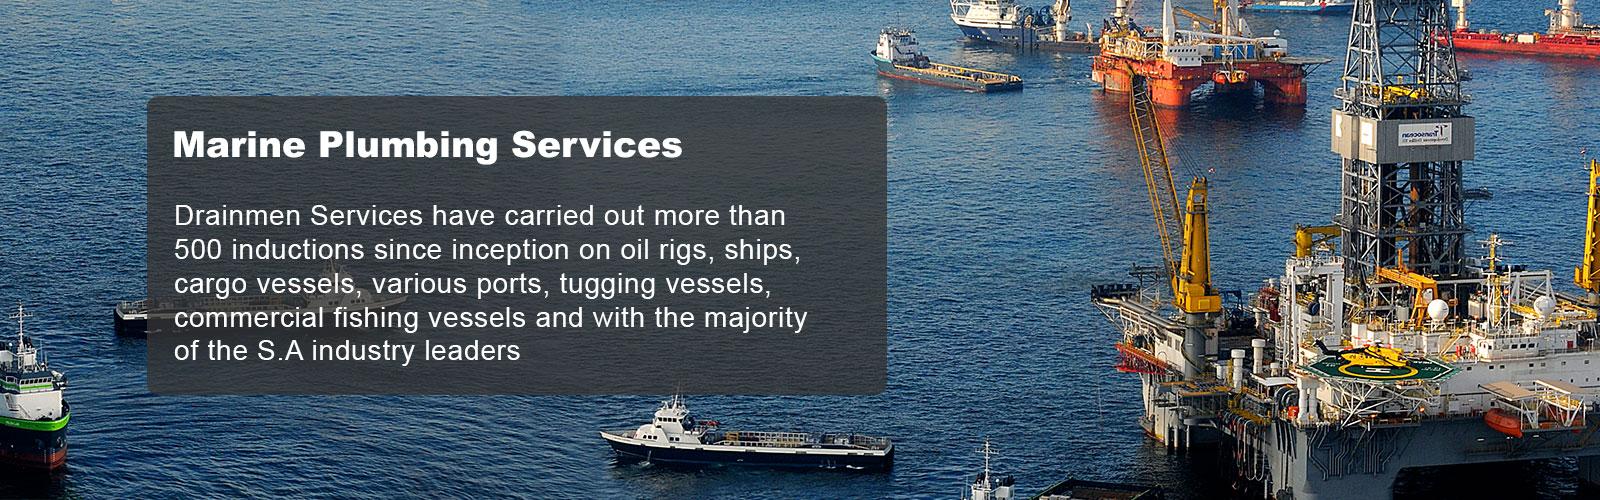 Marine Plumbing Services